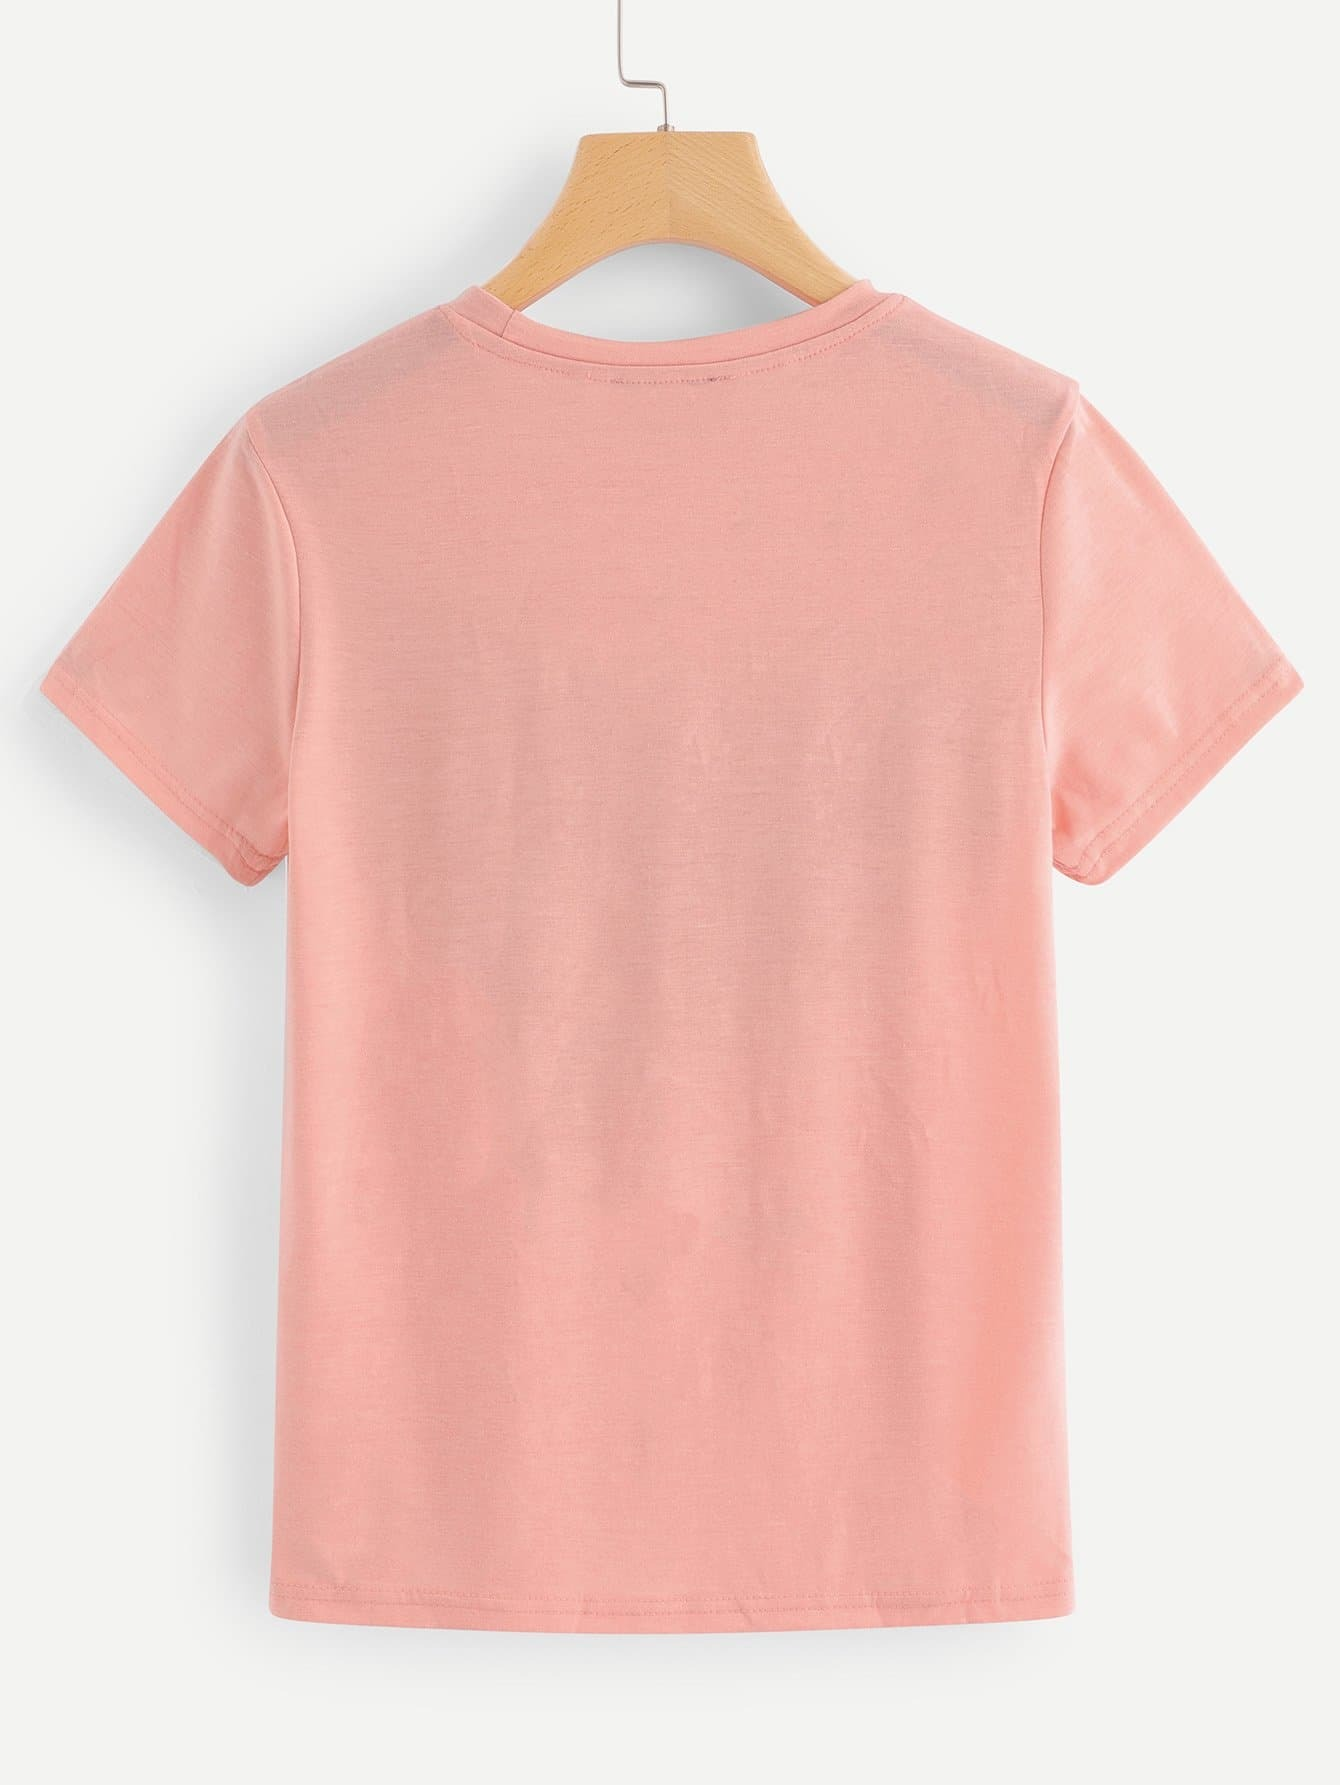 tee shirt avec franges french shein sheinside. Black Bedroom Furniture Sets. Home Design Ideas